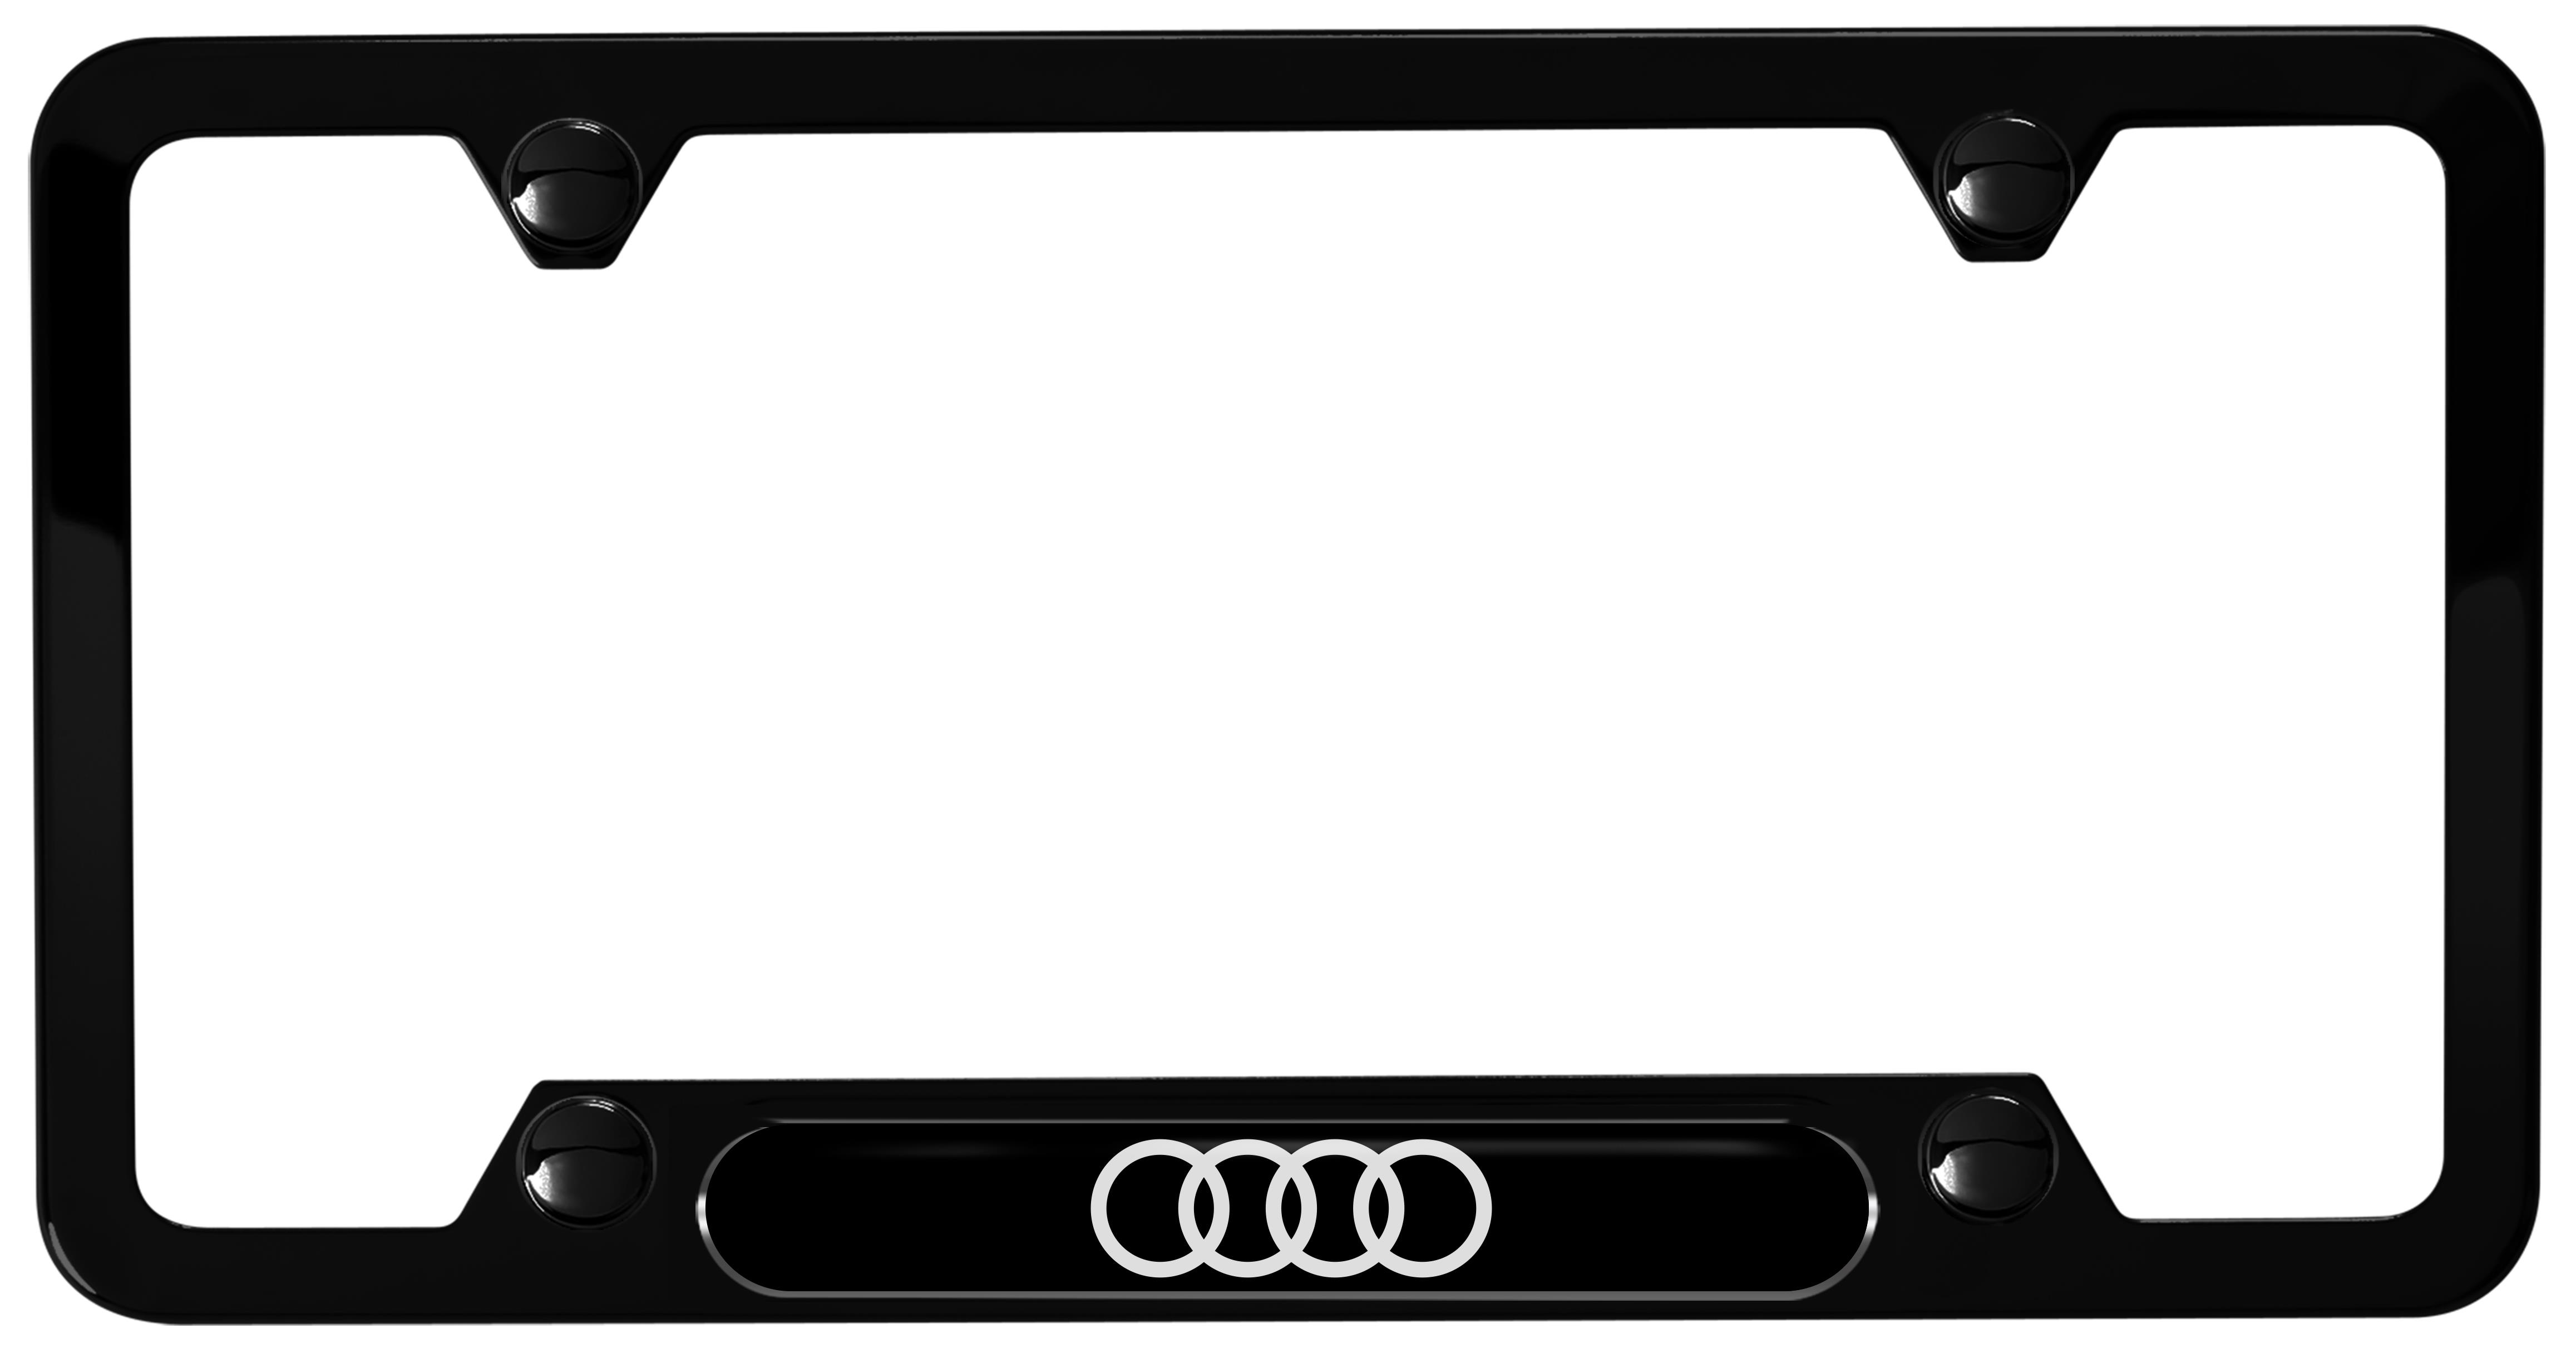 2017 Audi A4 Audi Rings License Plate Frame Black Powder